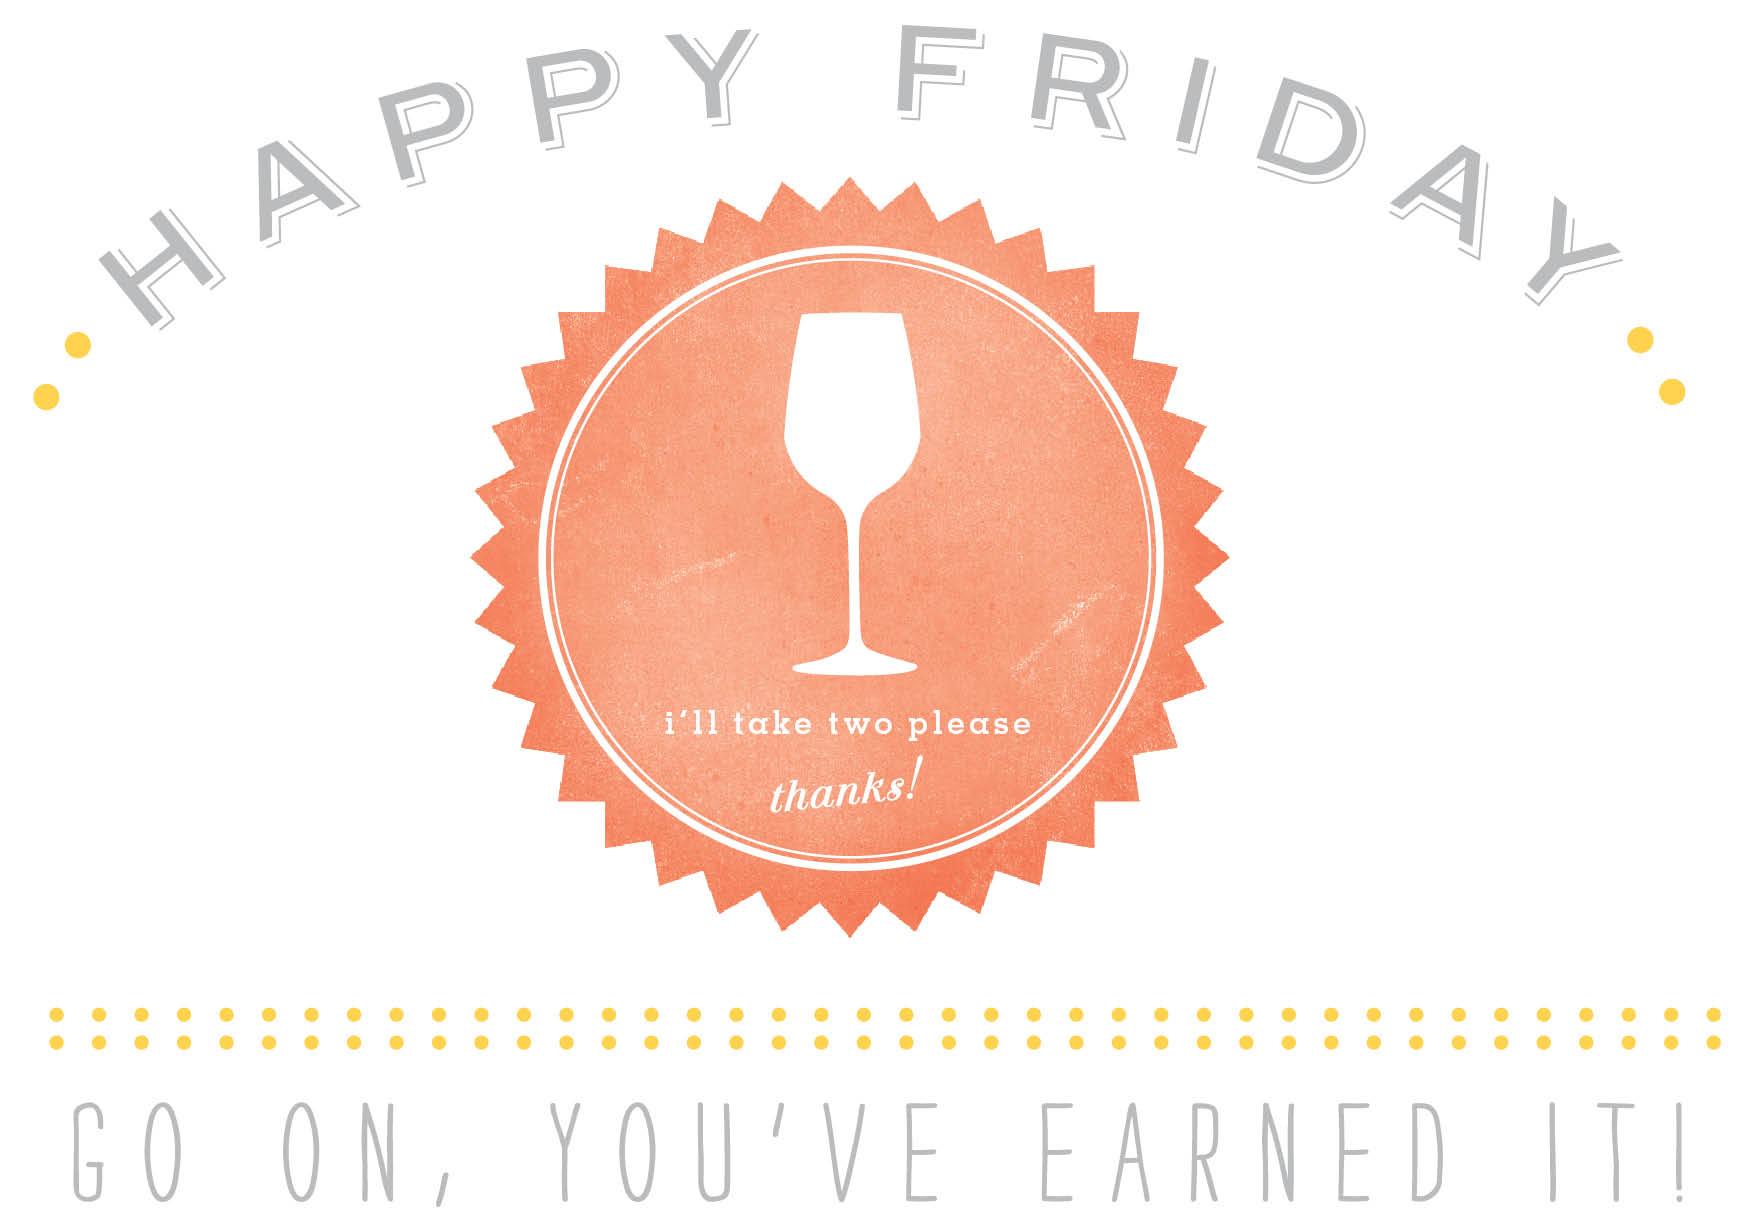 Happy Friday Photos & Wallpaper